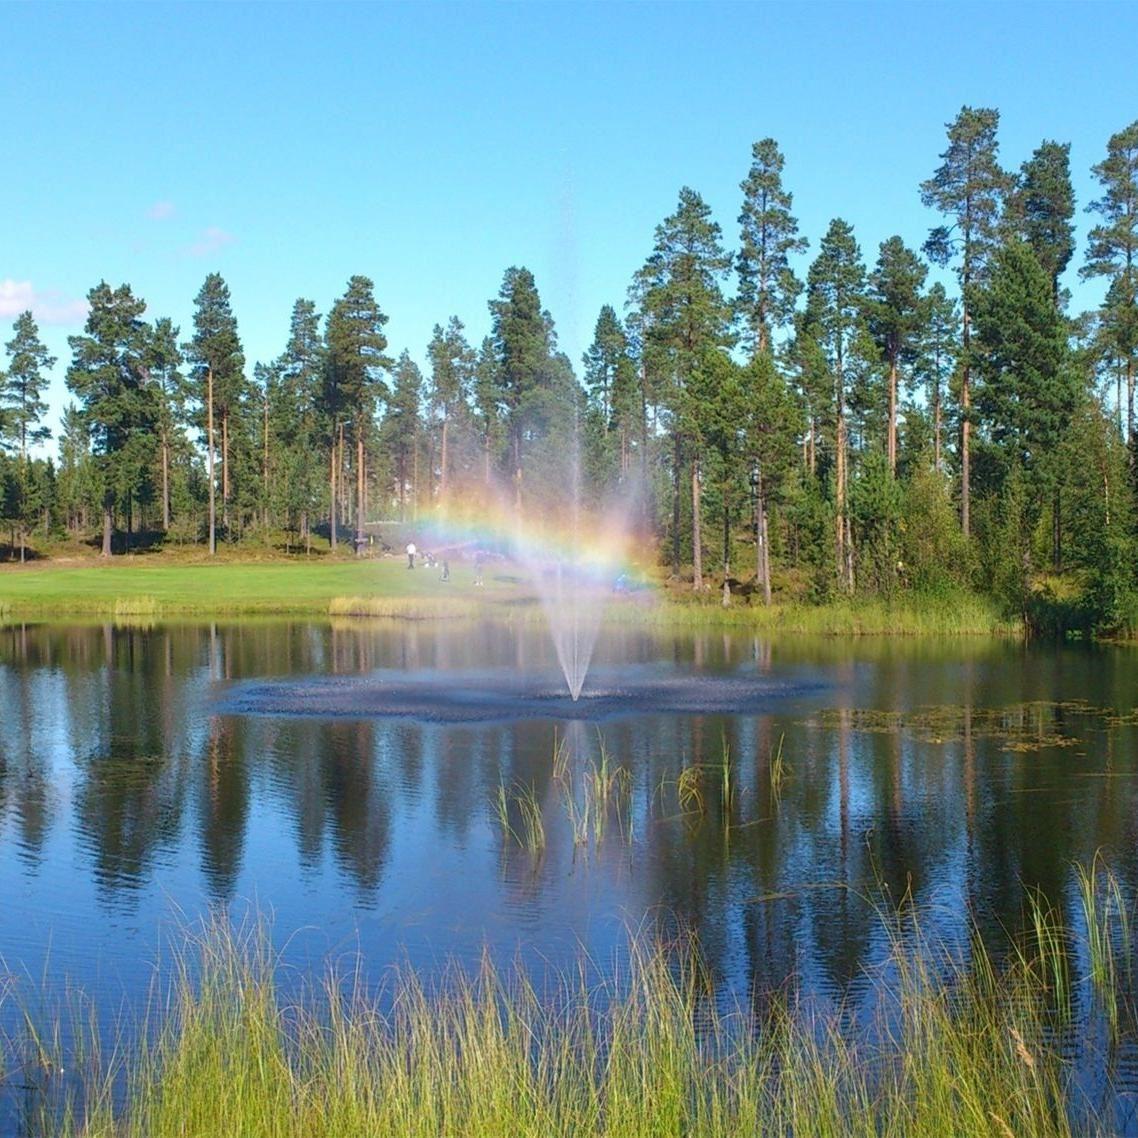 Norrfällsvikens Golfklubb